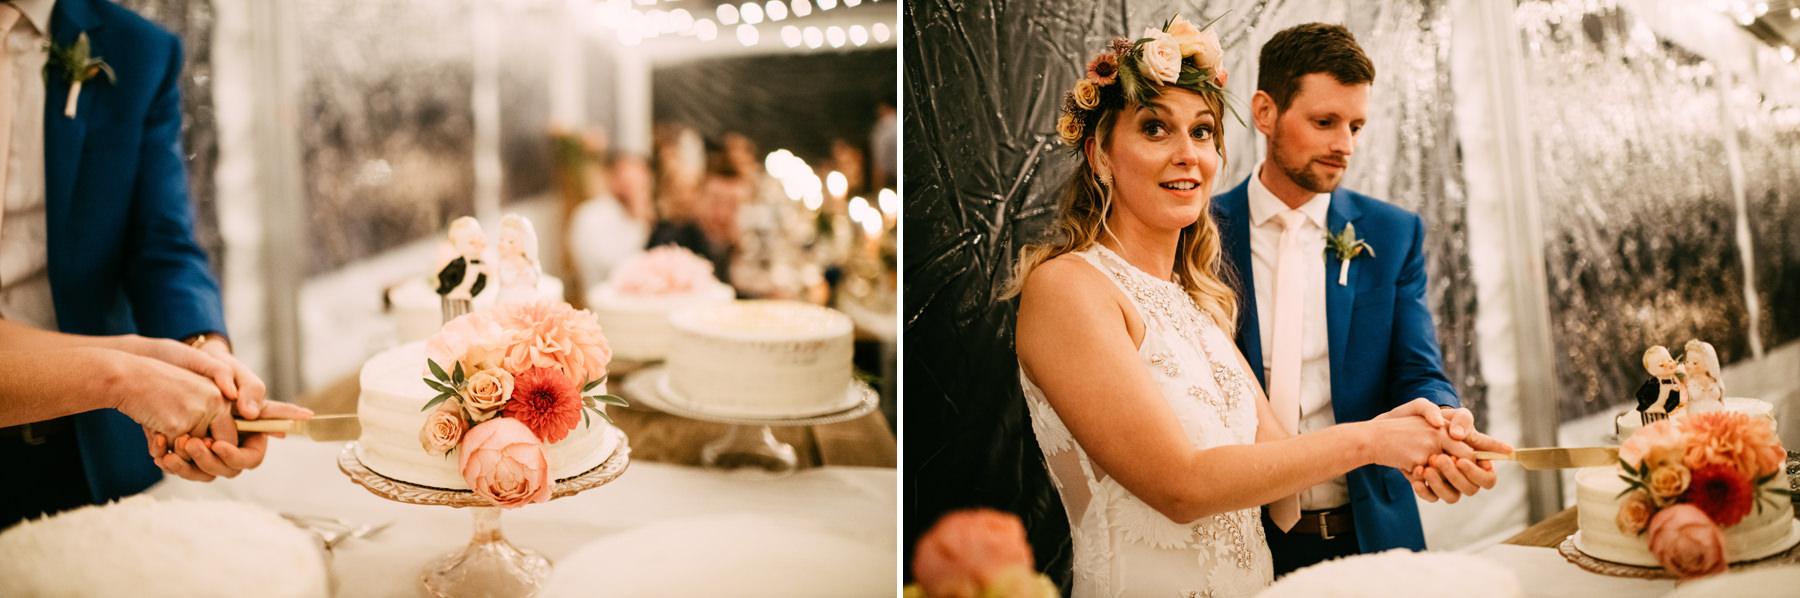 389-colorful-outdoor-lopez-island-wedding.jpg